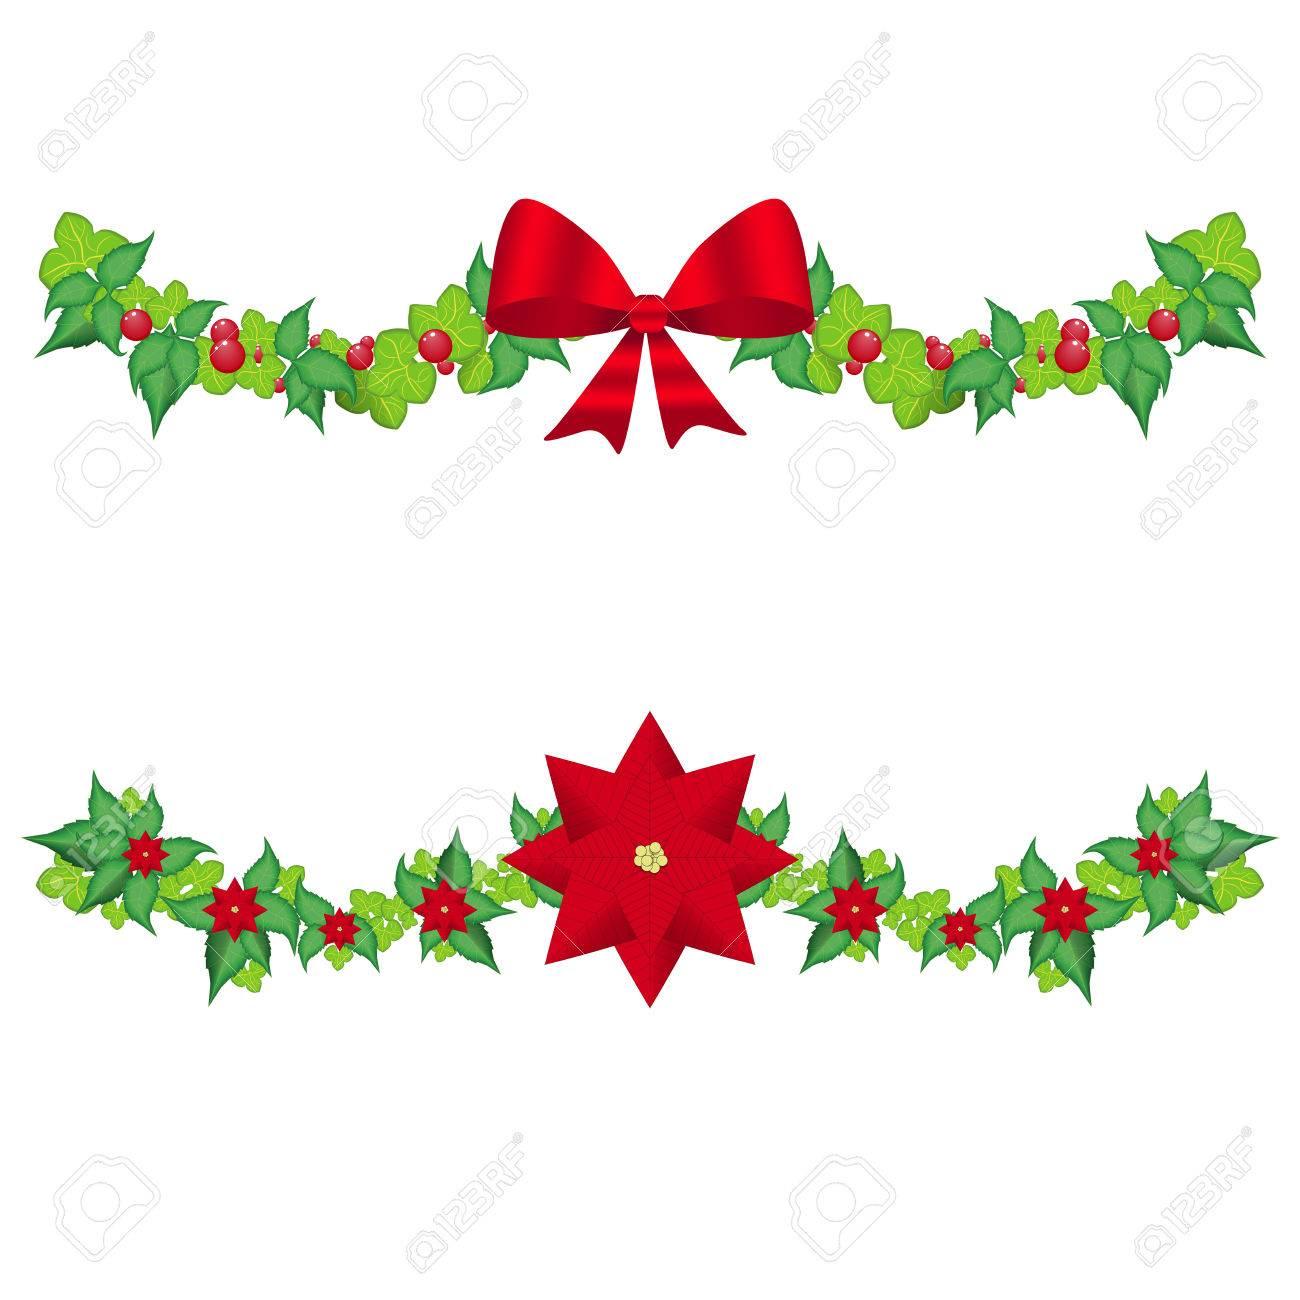 cheap with guirnaldas de navidad guirnaldas navidad - Guirnaldas De Navidad